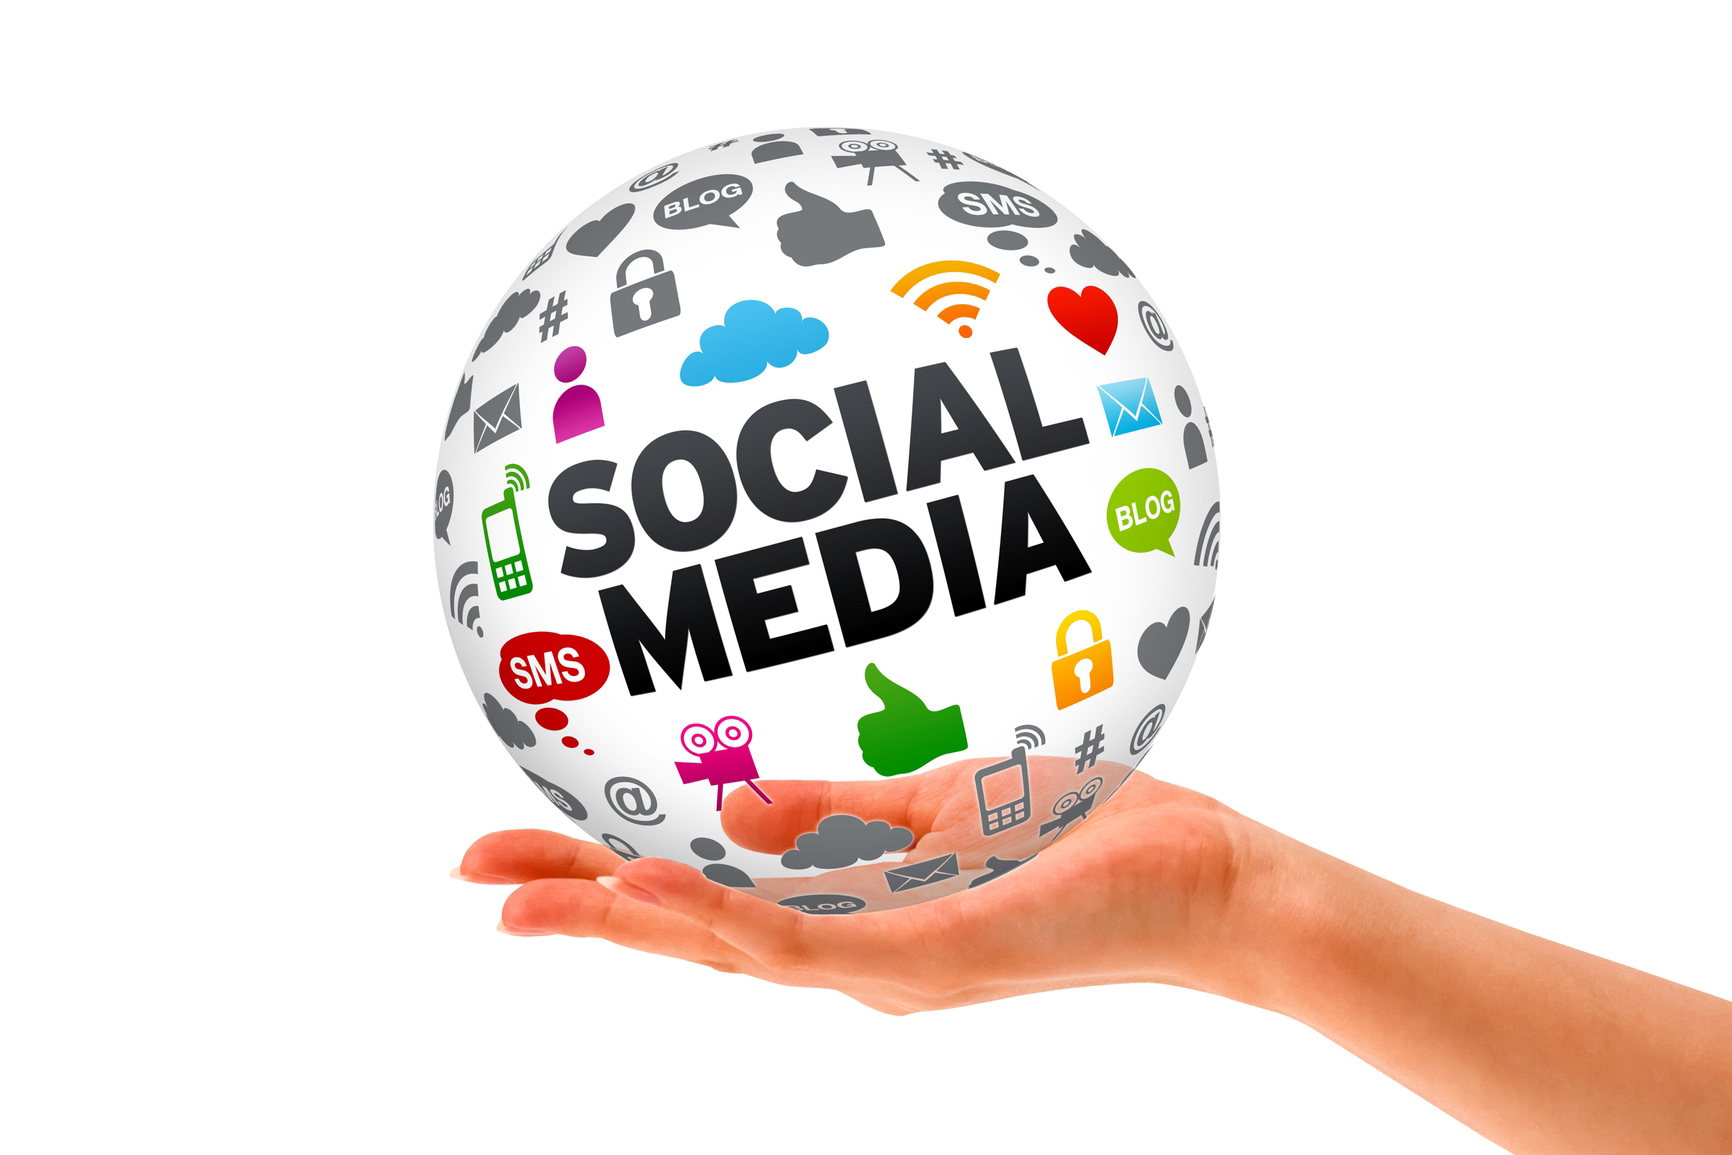 Essential Elements of Effective Social Media Marketing